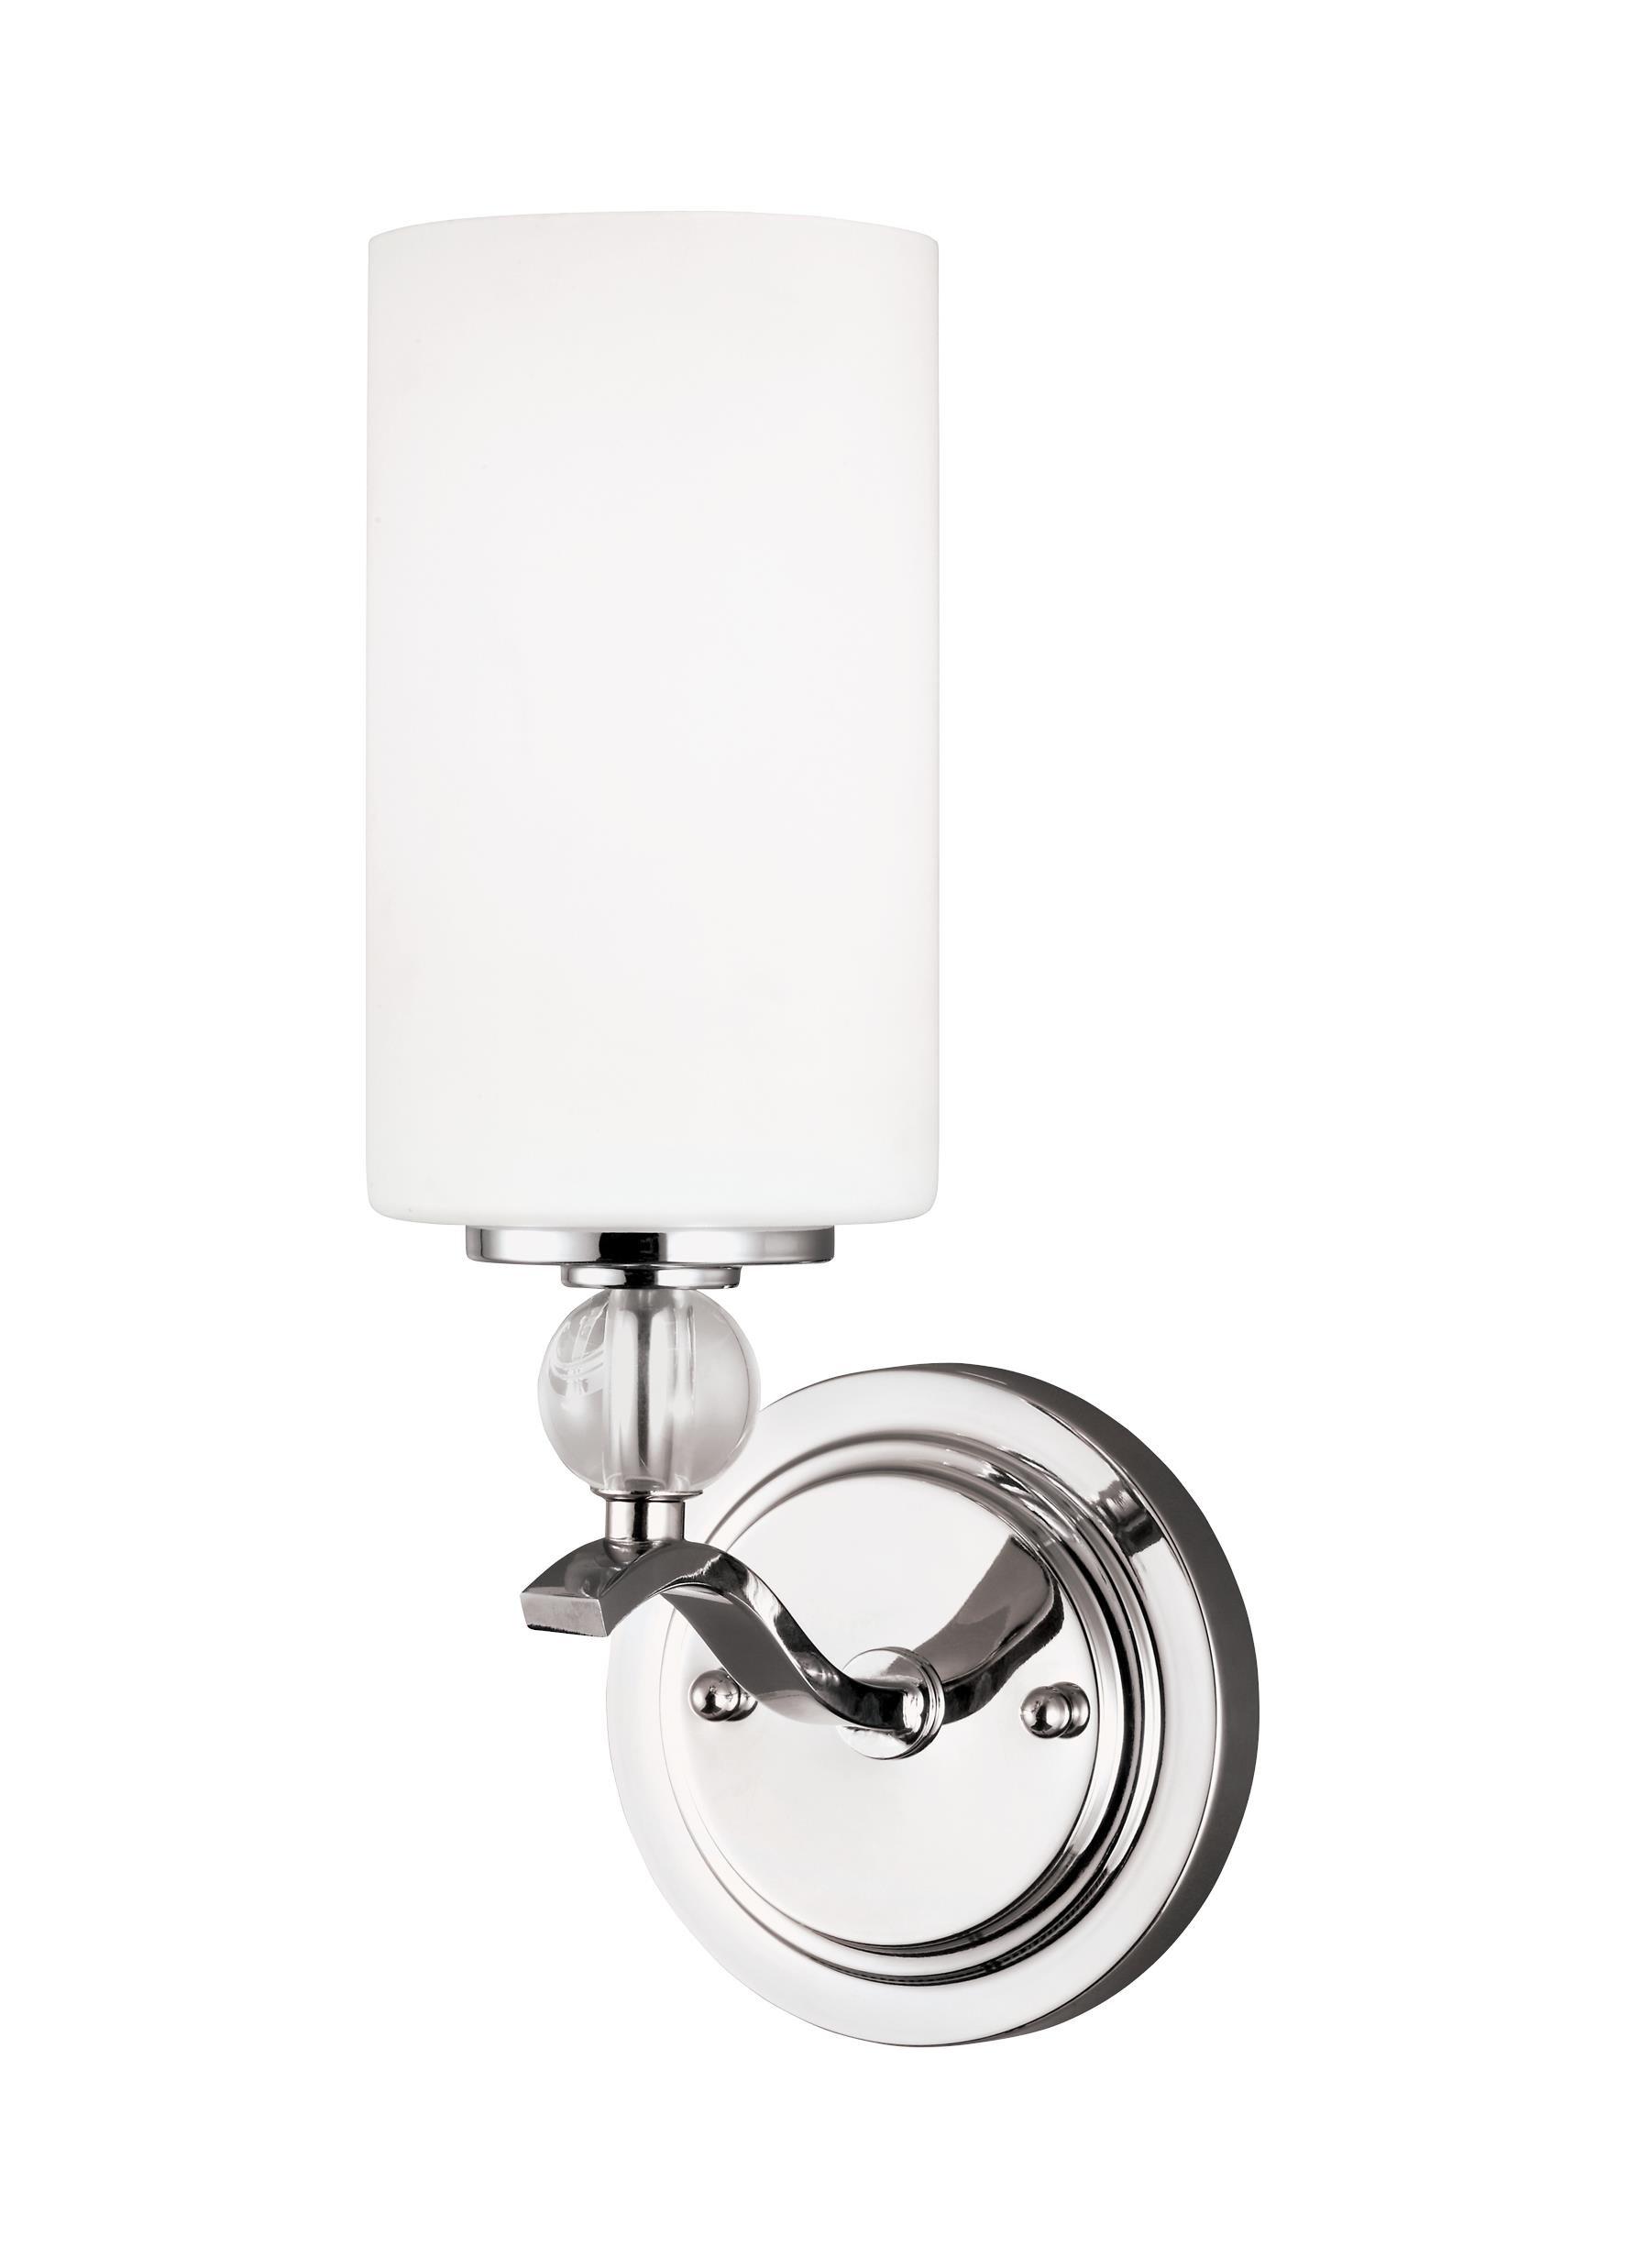 Sea Gull Lighting 4113401EN3-05 Englehorn One-Light Bath Or Wall Light Fixture with Glass Shade, Chrome Finish